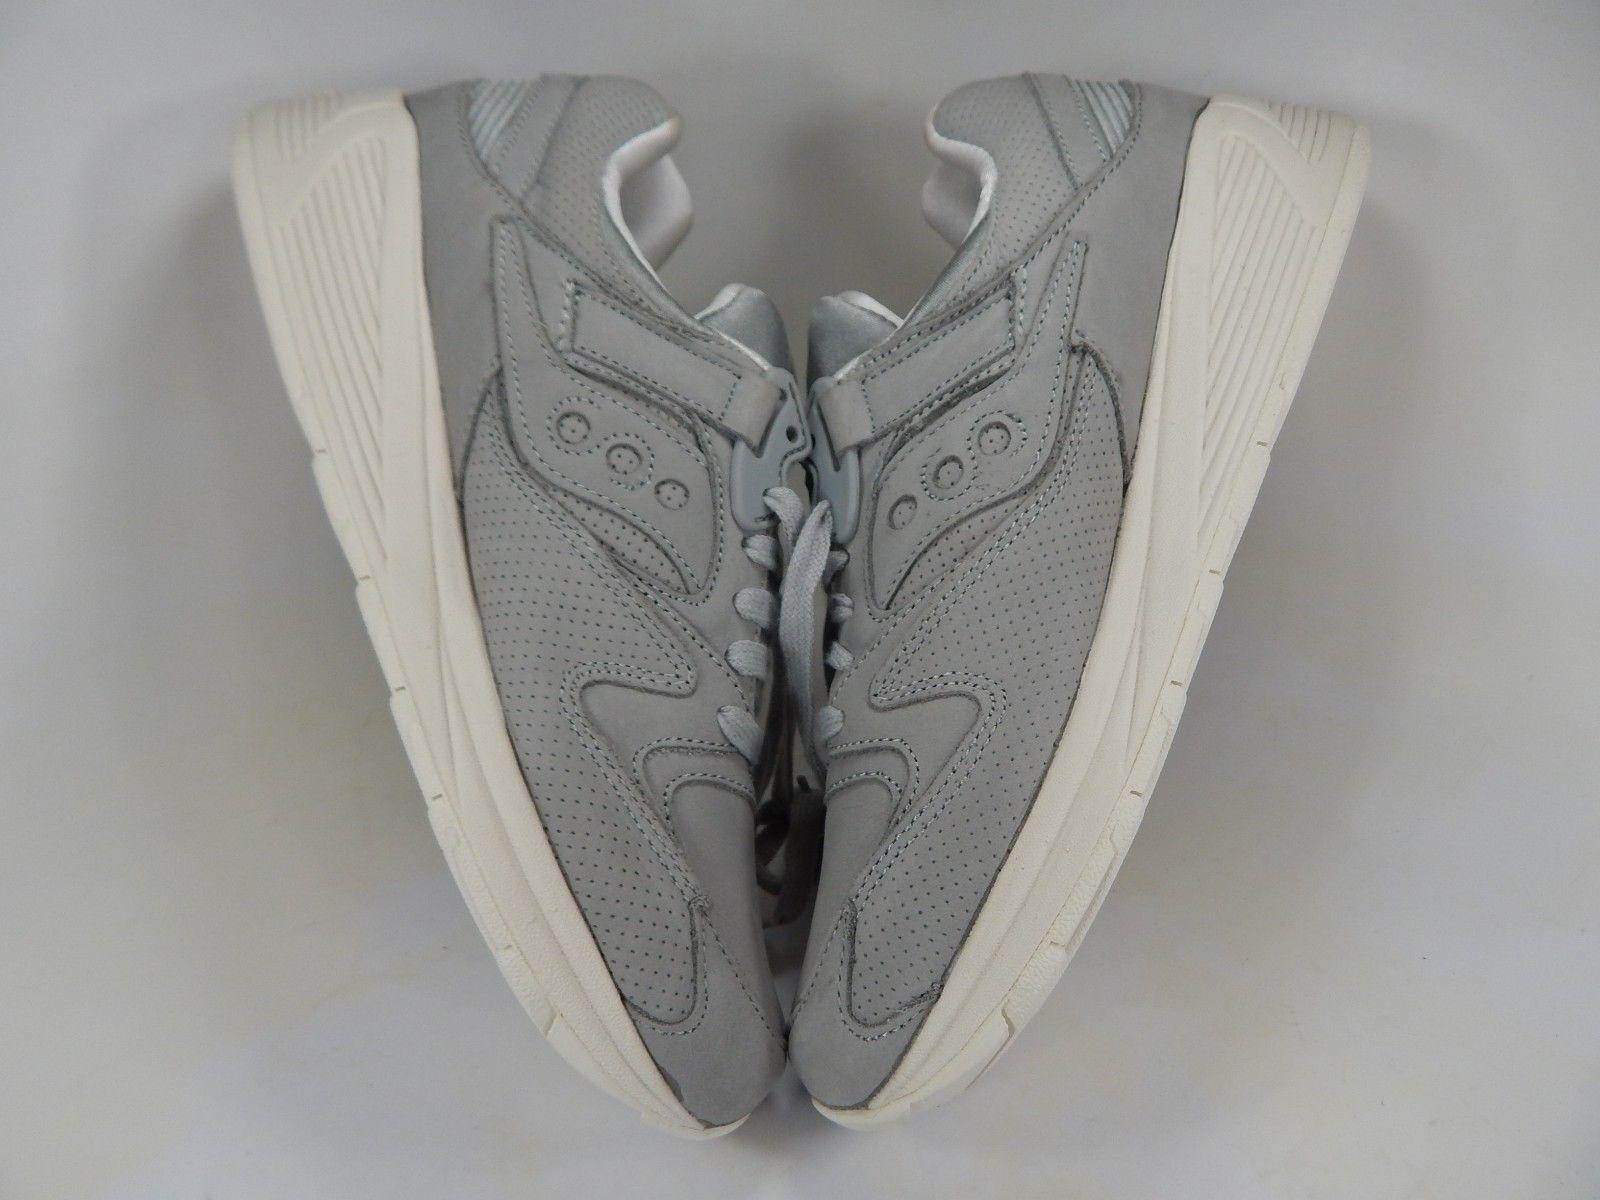 Saucony Grid 8500 HT Original Running Shoes Men's Size 9 M EU 42.5 Gray S70390-3